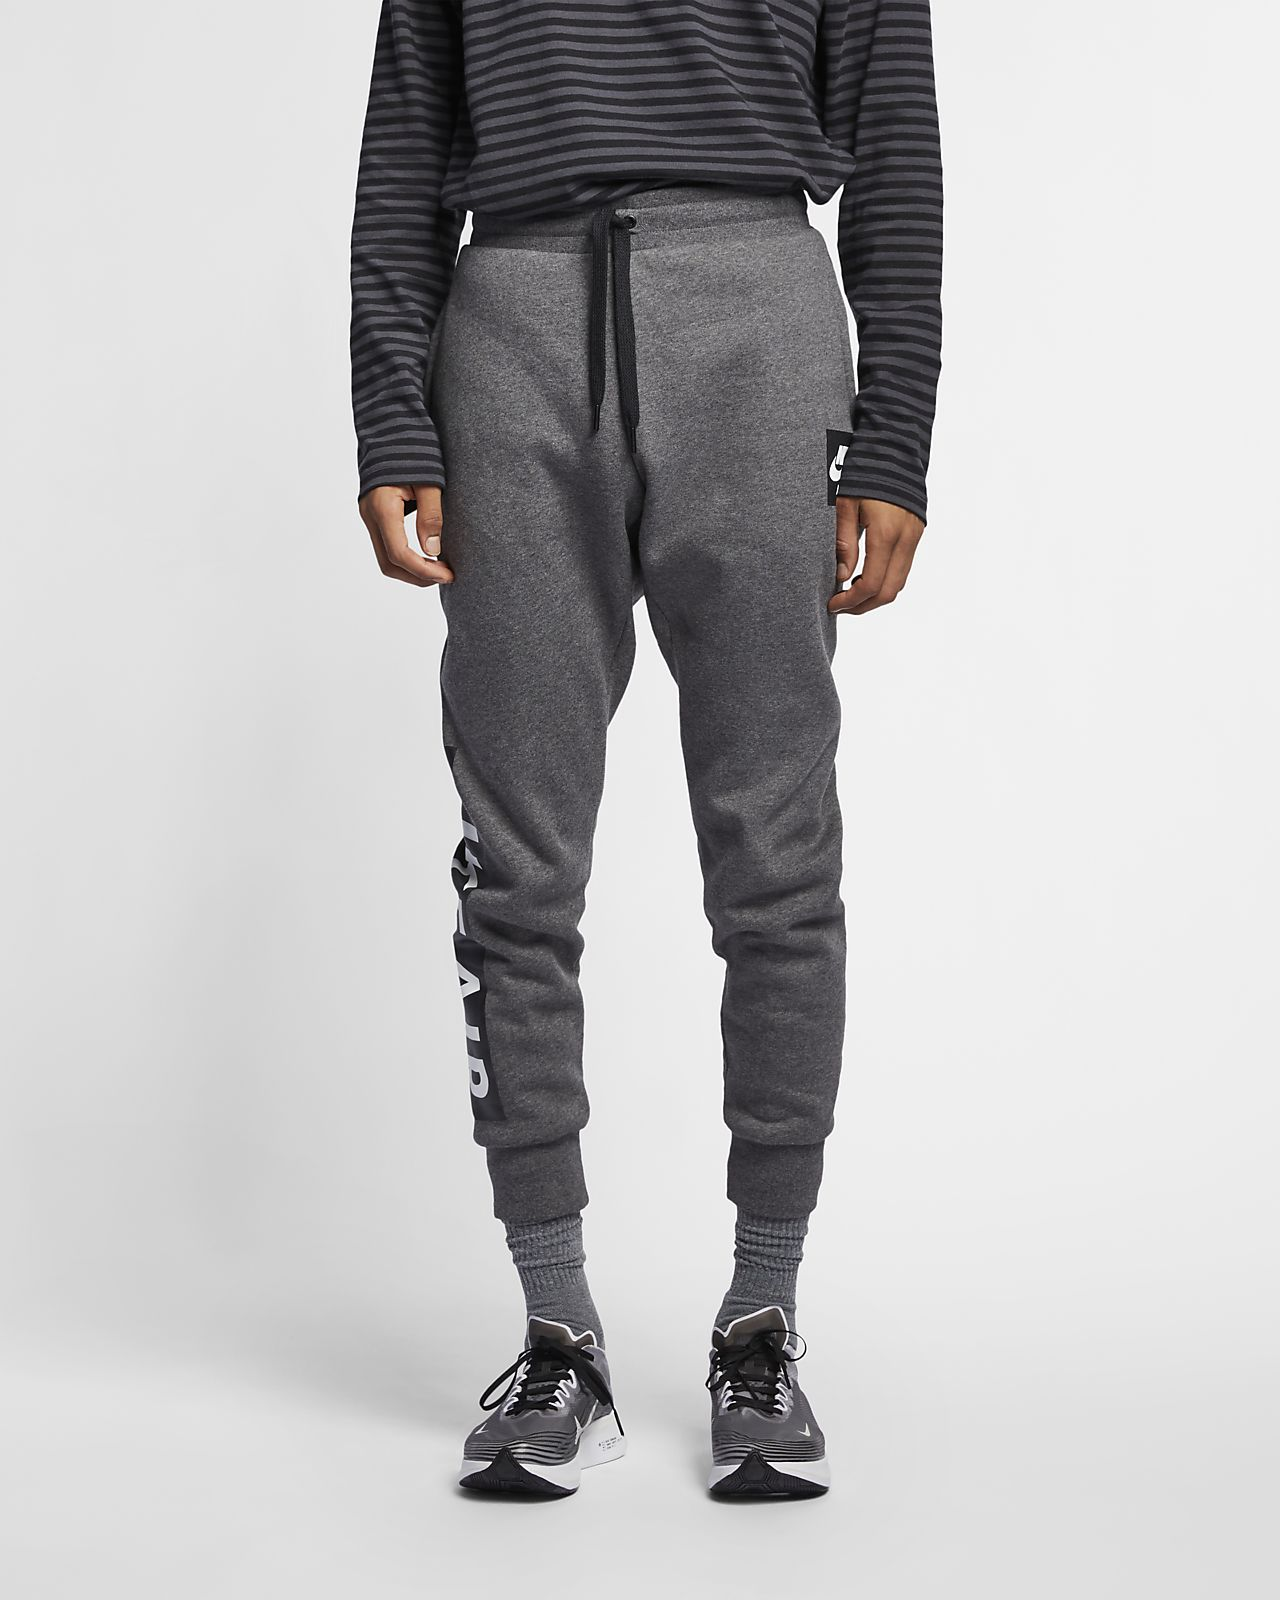 afcc458b5c25 Nike Air Men s Fleece Trousers. Nike.com DK